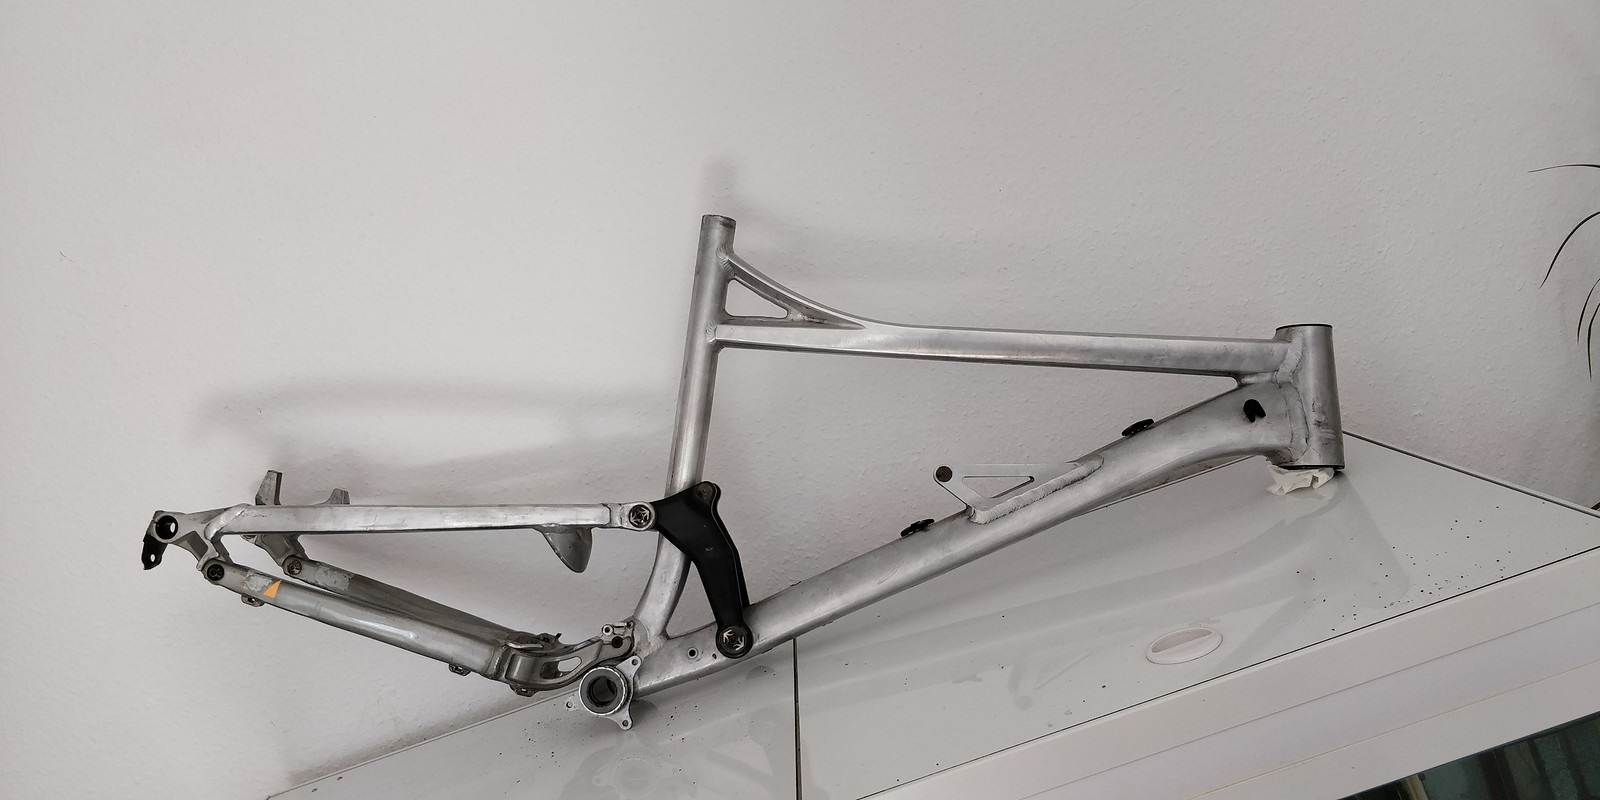 Carver CCB ICB/CCB Rahmen 27.5 in L /RAW / Neuteile / 216x63mm ...